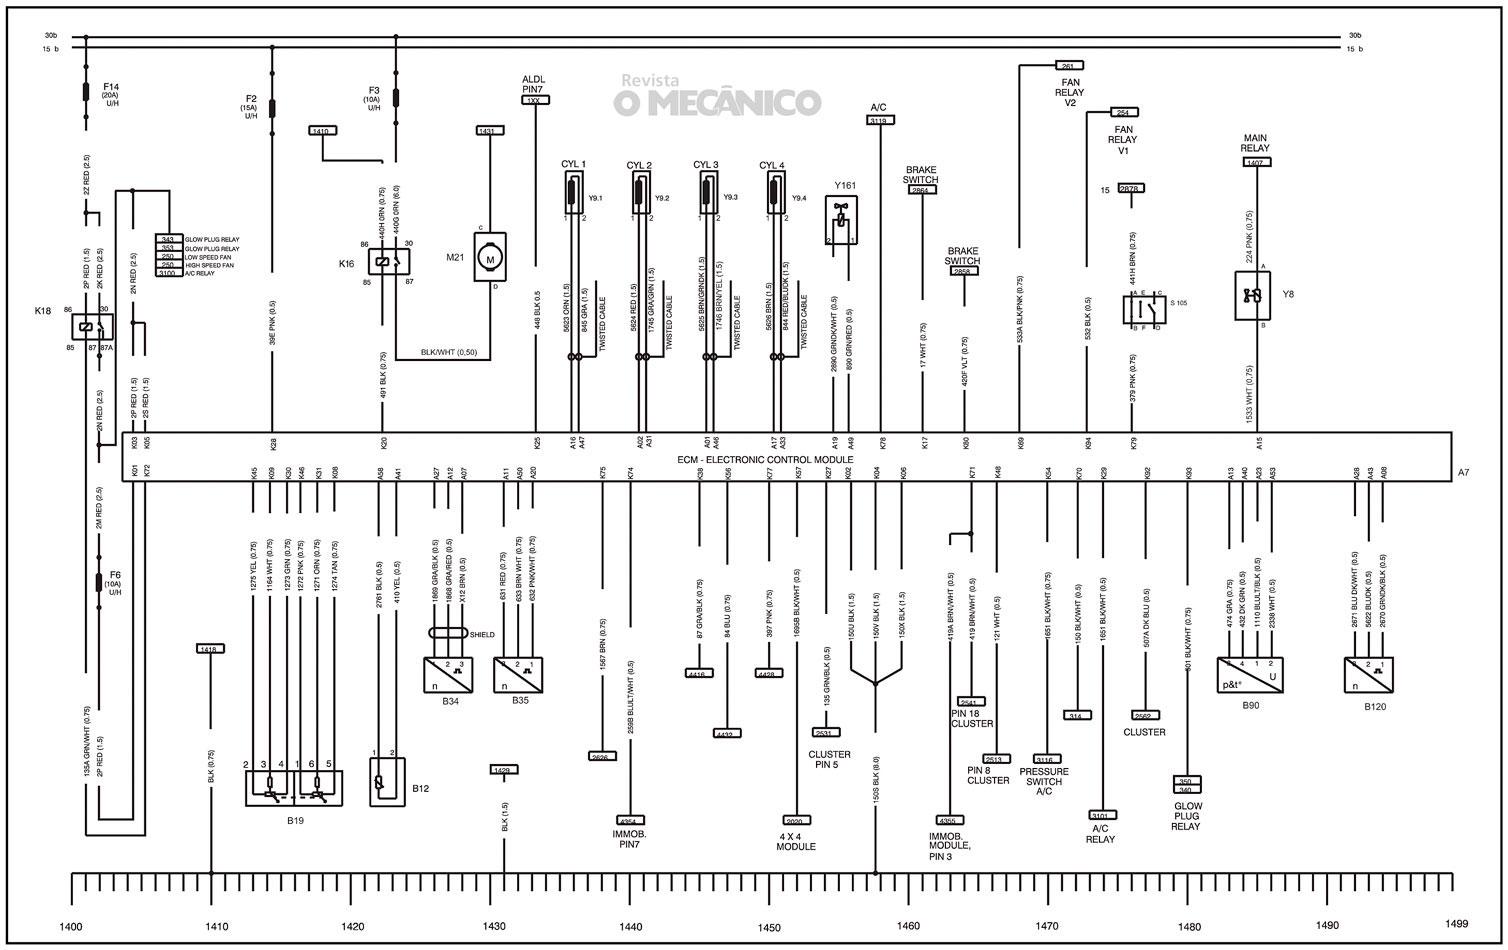 93 S10 Blazer Radio Wiring Diagram